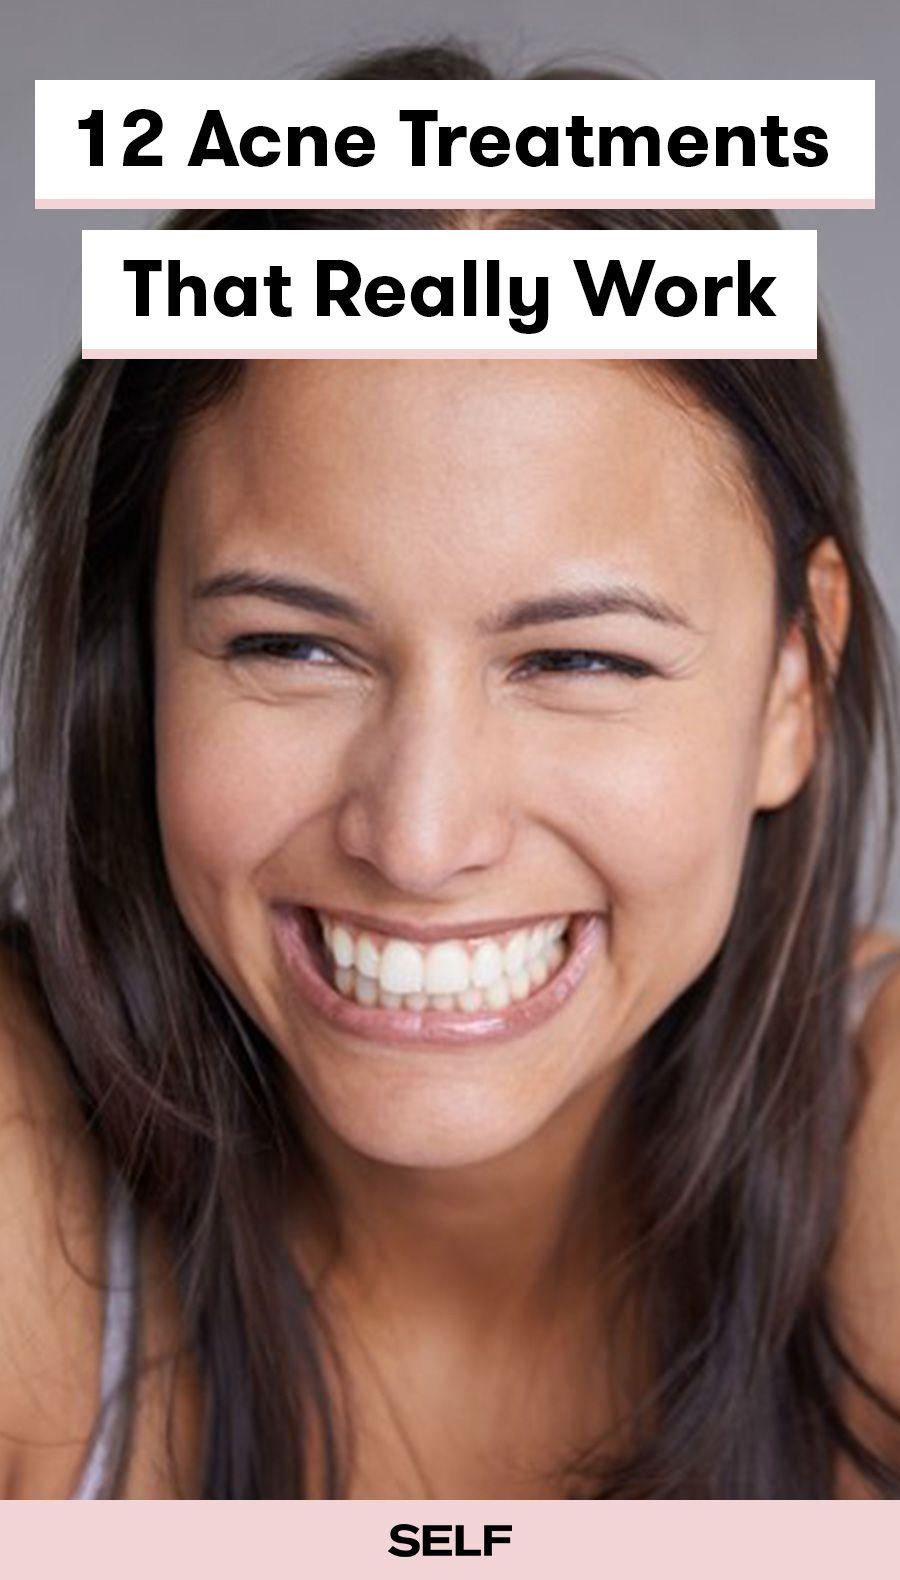 Acne Treatments That Really Work  Beauty  Pinterest  Acne